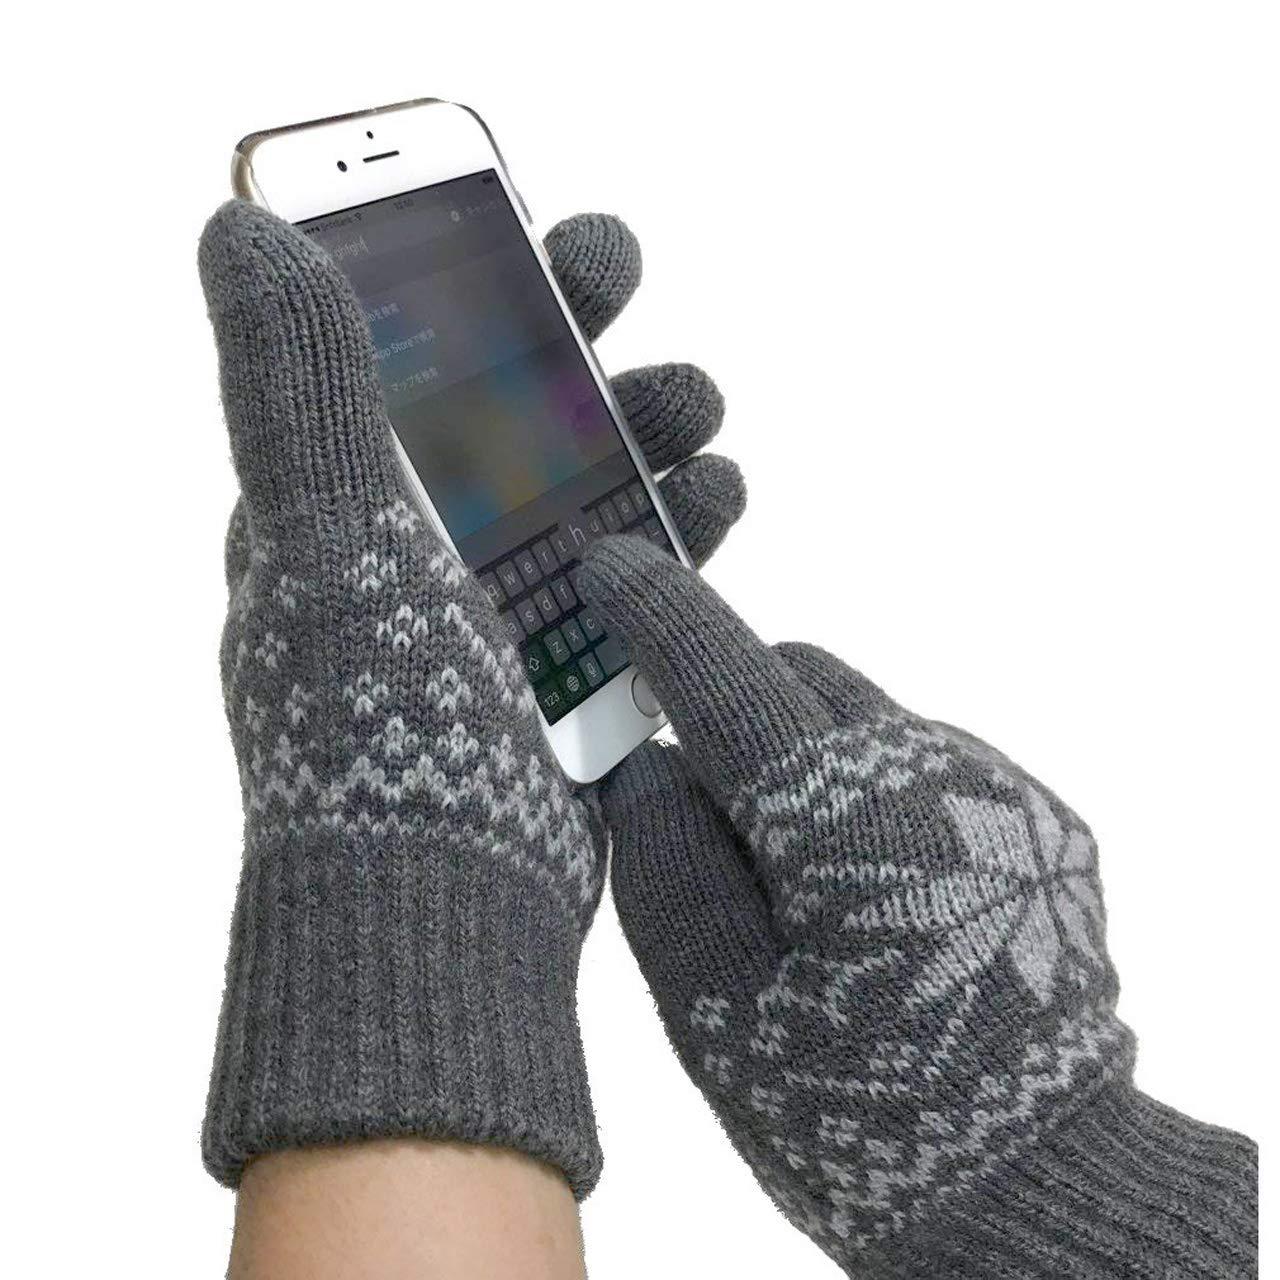 [ZakkaRico] 手袋 裏起毛 極暖 防寒 フカフカ 暖かい グローブ スマホ スマートフォン対応 ノルディック